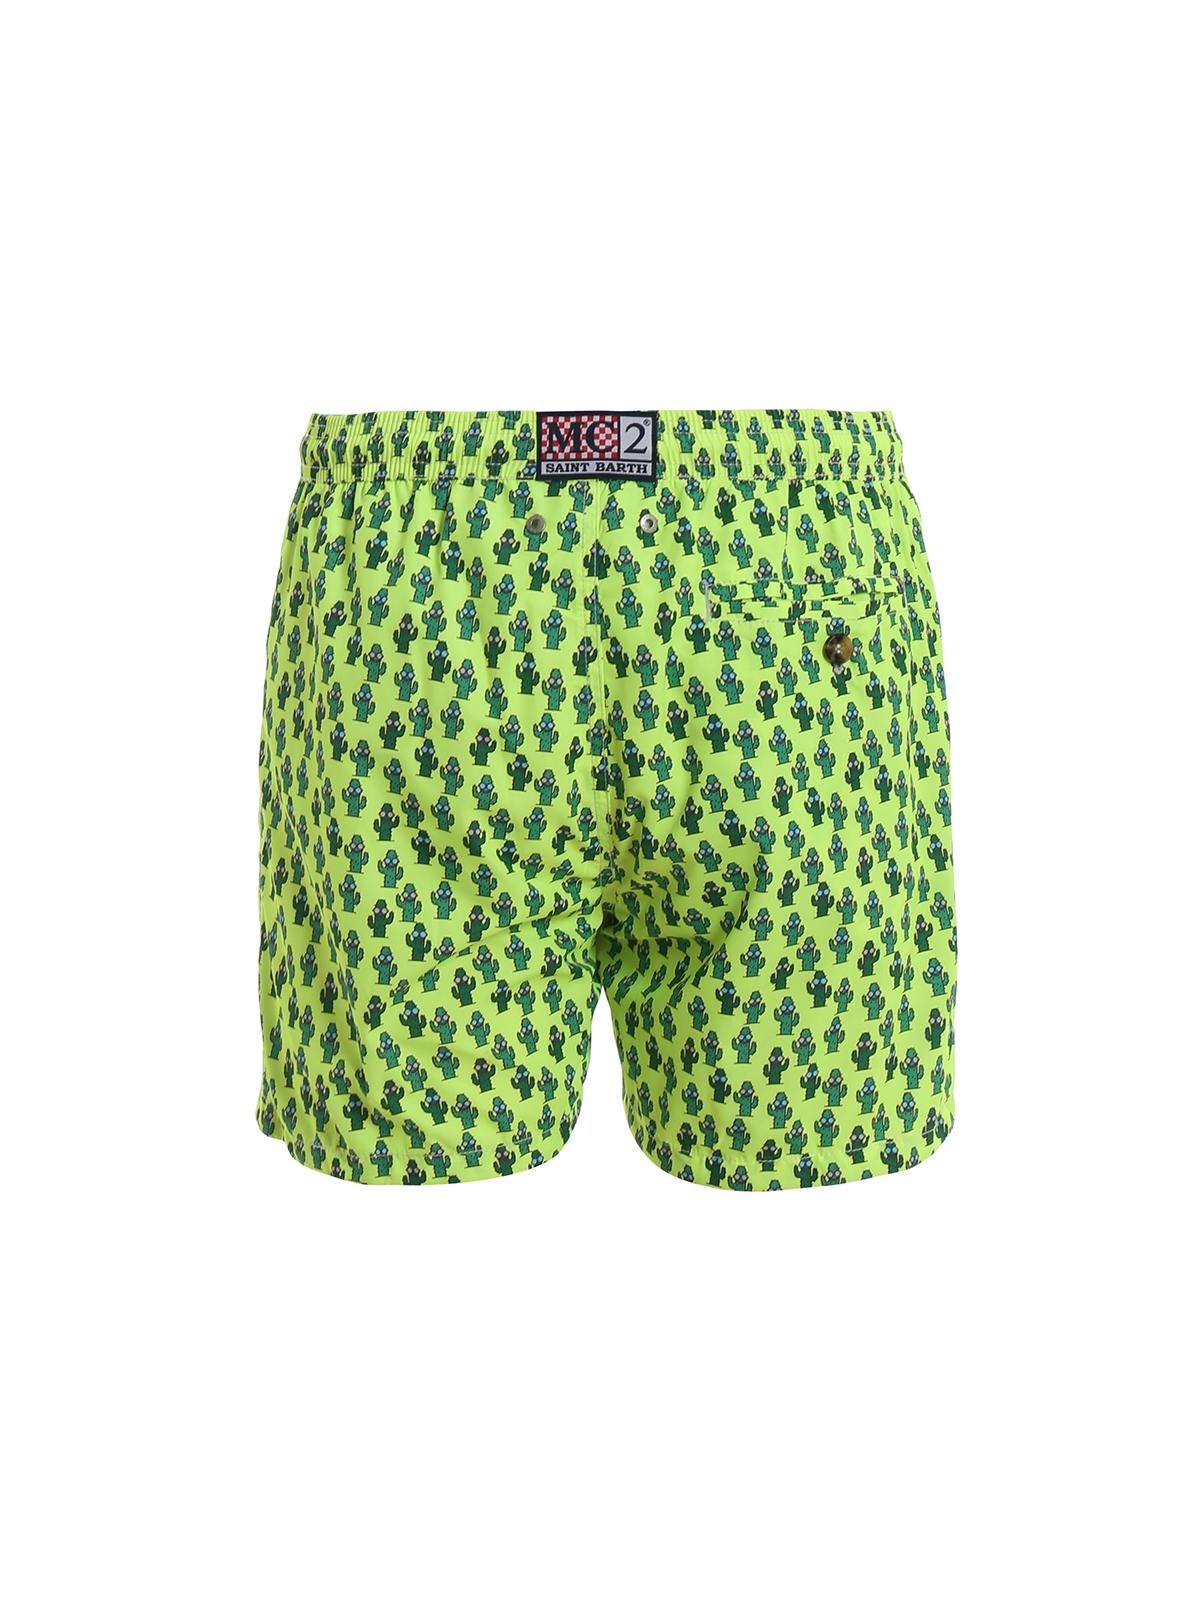 a7f2929bb1 MC2 SAINT BARTH: Swim shorts & swimming trunks online - Lighting Micro  cactus print swim